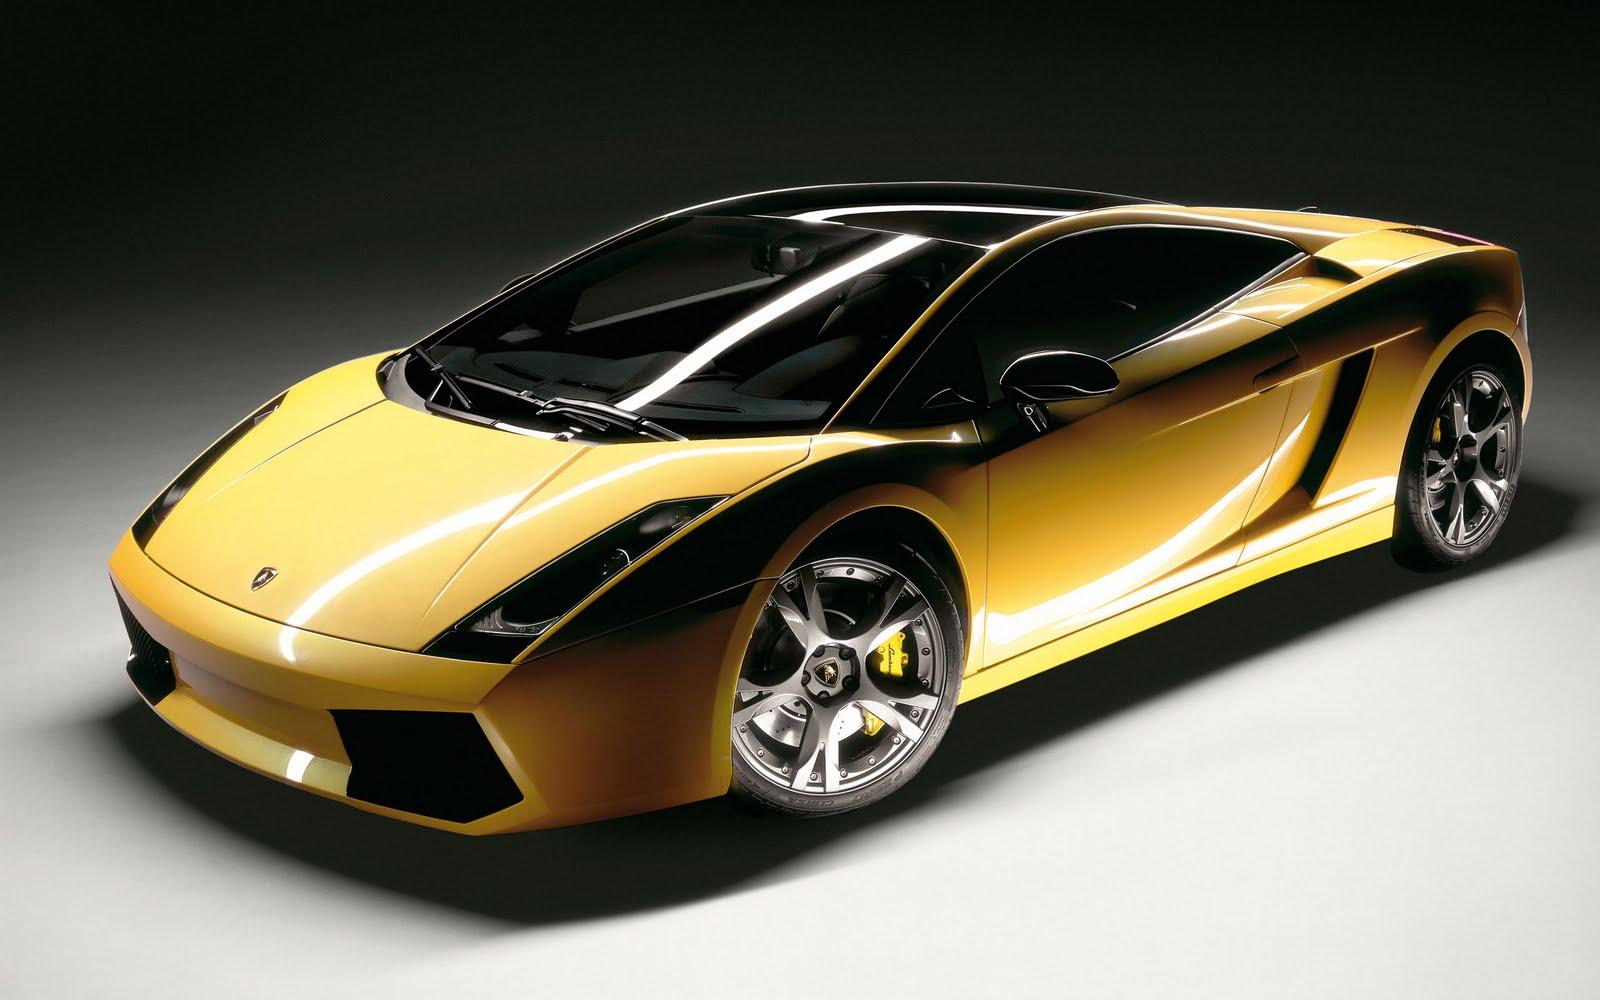 http://1.bp.blogspot.com/-qG4gtnIggvQ/TkCH0E-q_8I/AAAAAAAAAos/RJ8OmqT0jy0/s1600/PSP-Car-Wallpaper.jpg